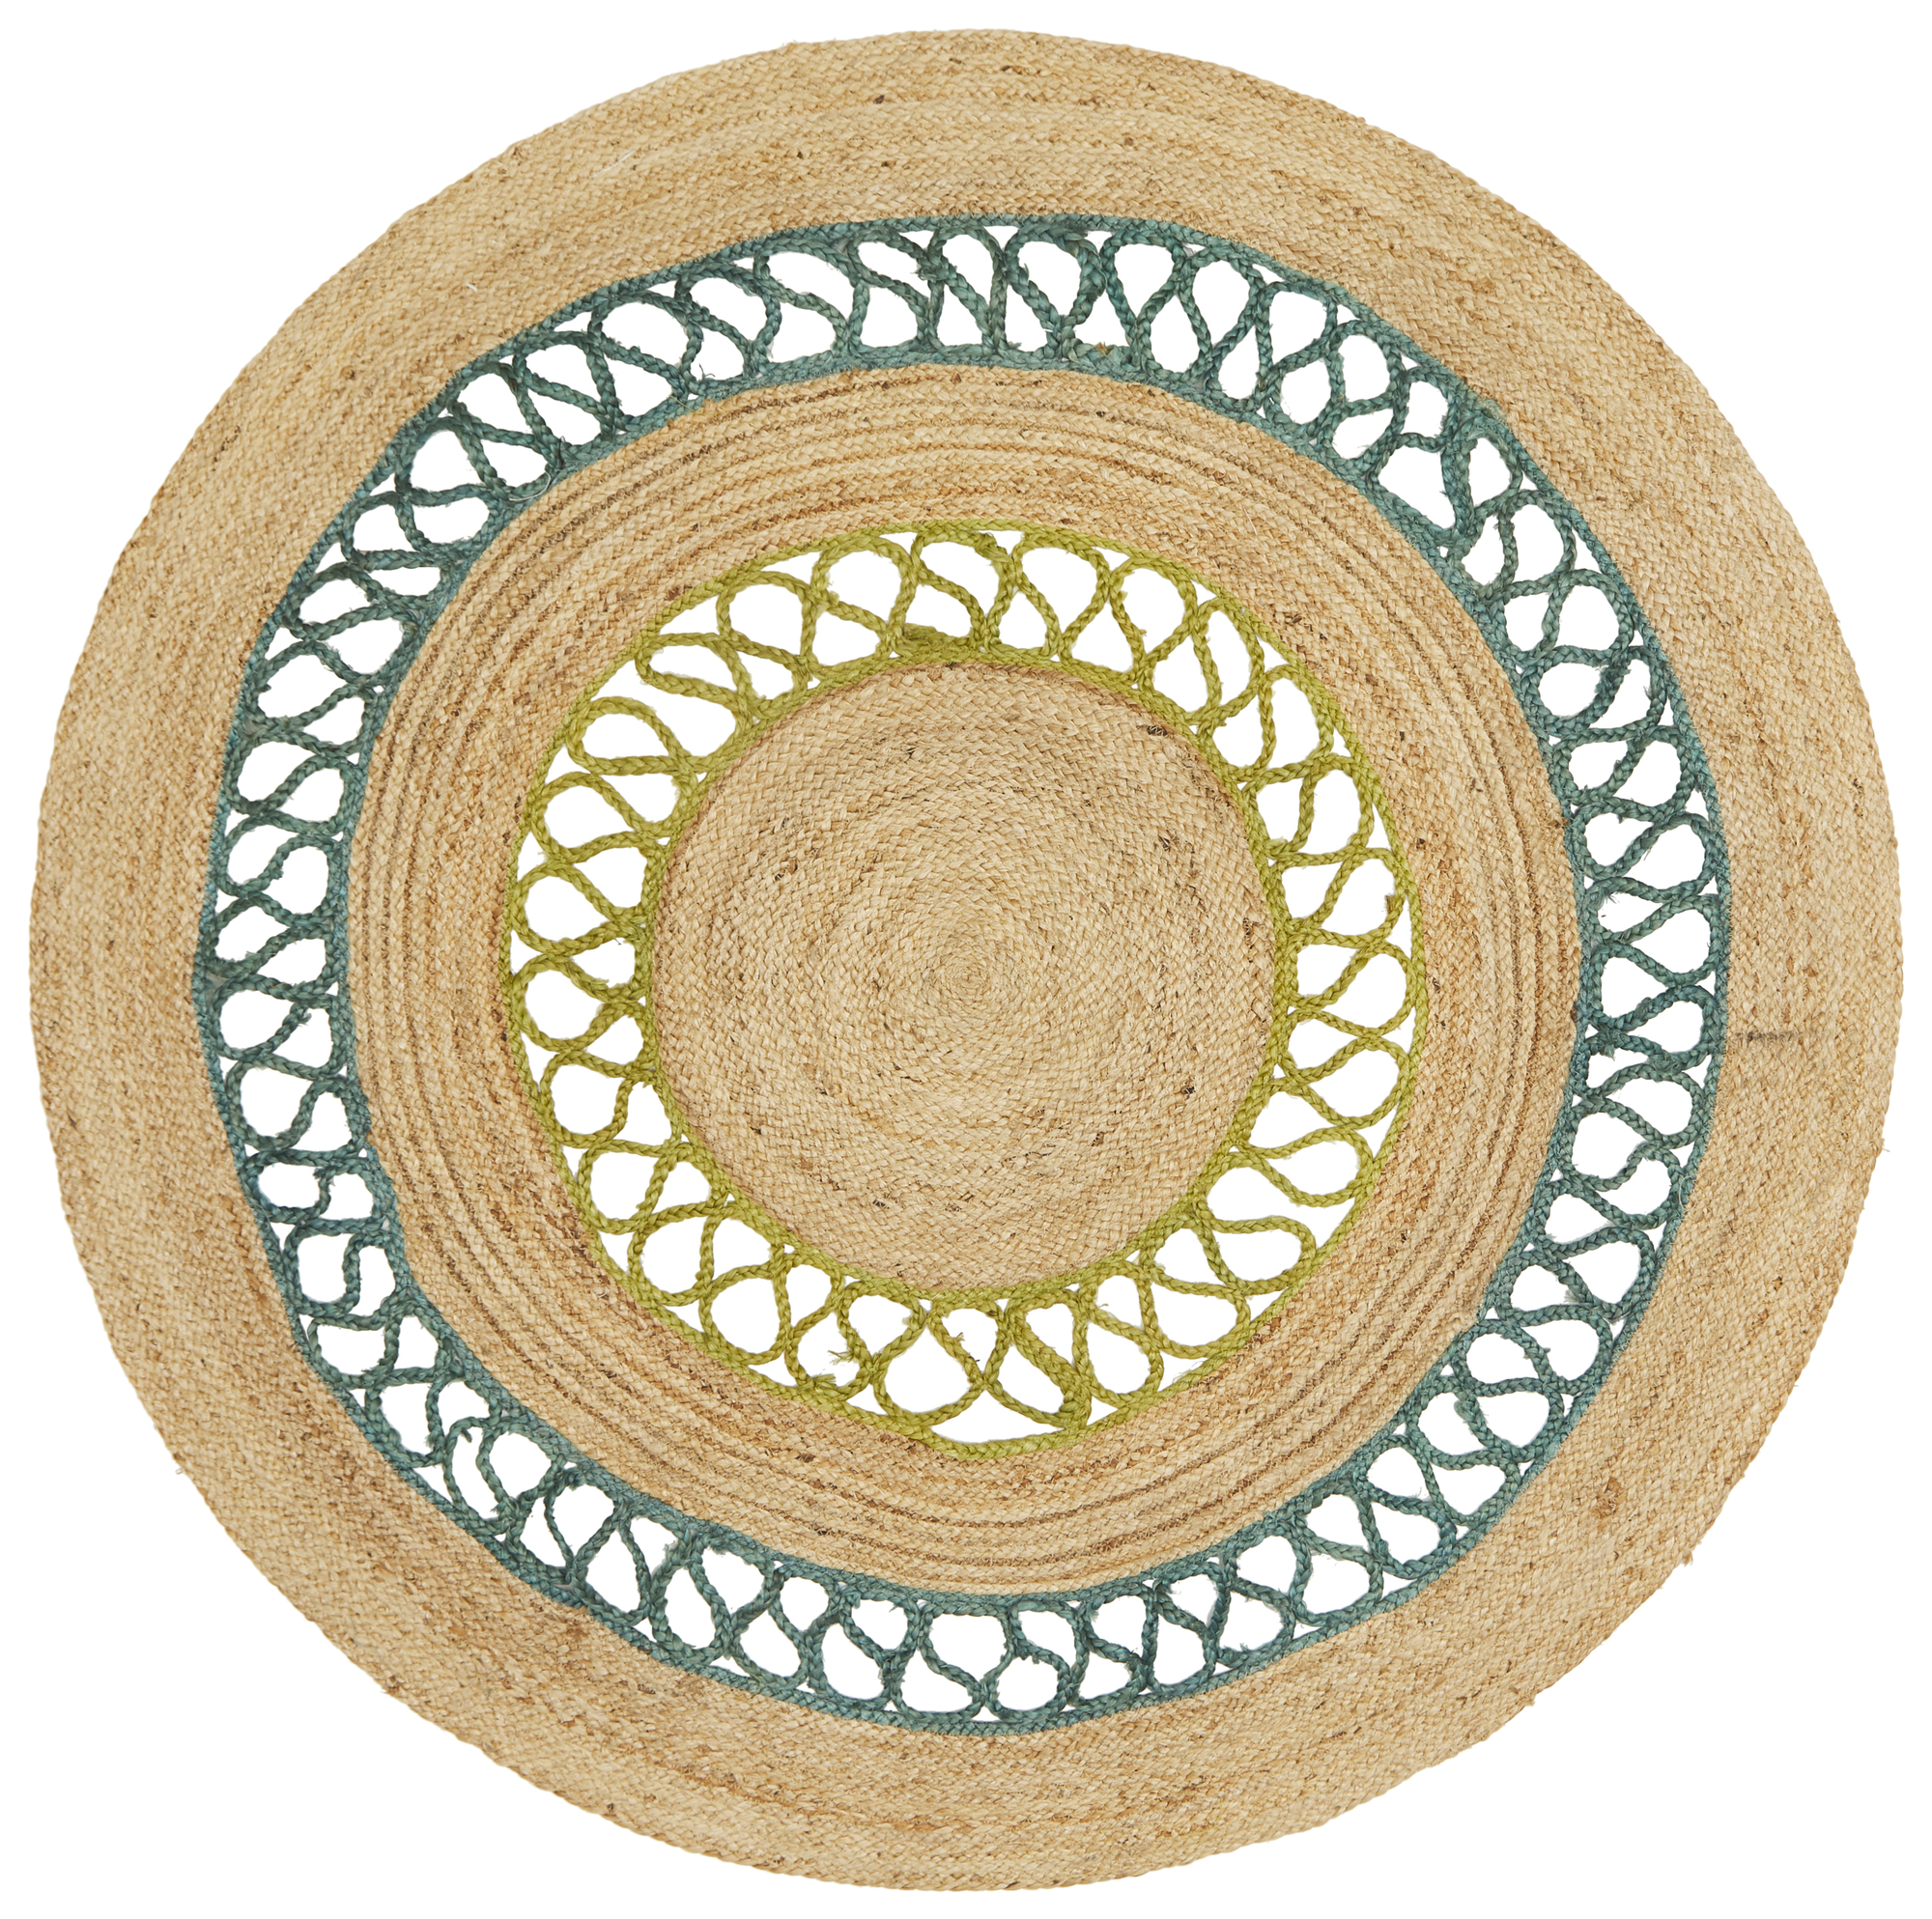 NEW-Hawaii-Jasmine-Hand-Braided-Turquoise-Rug-Network-Rugs